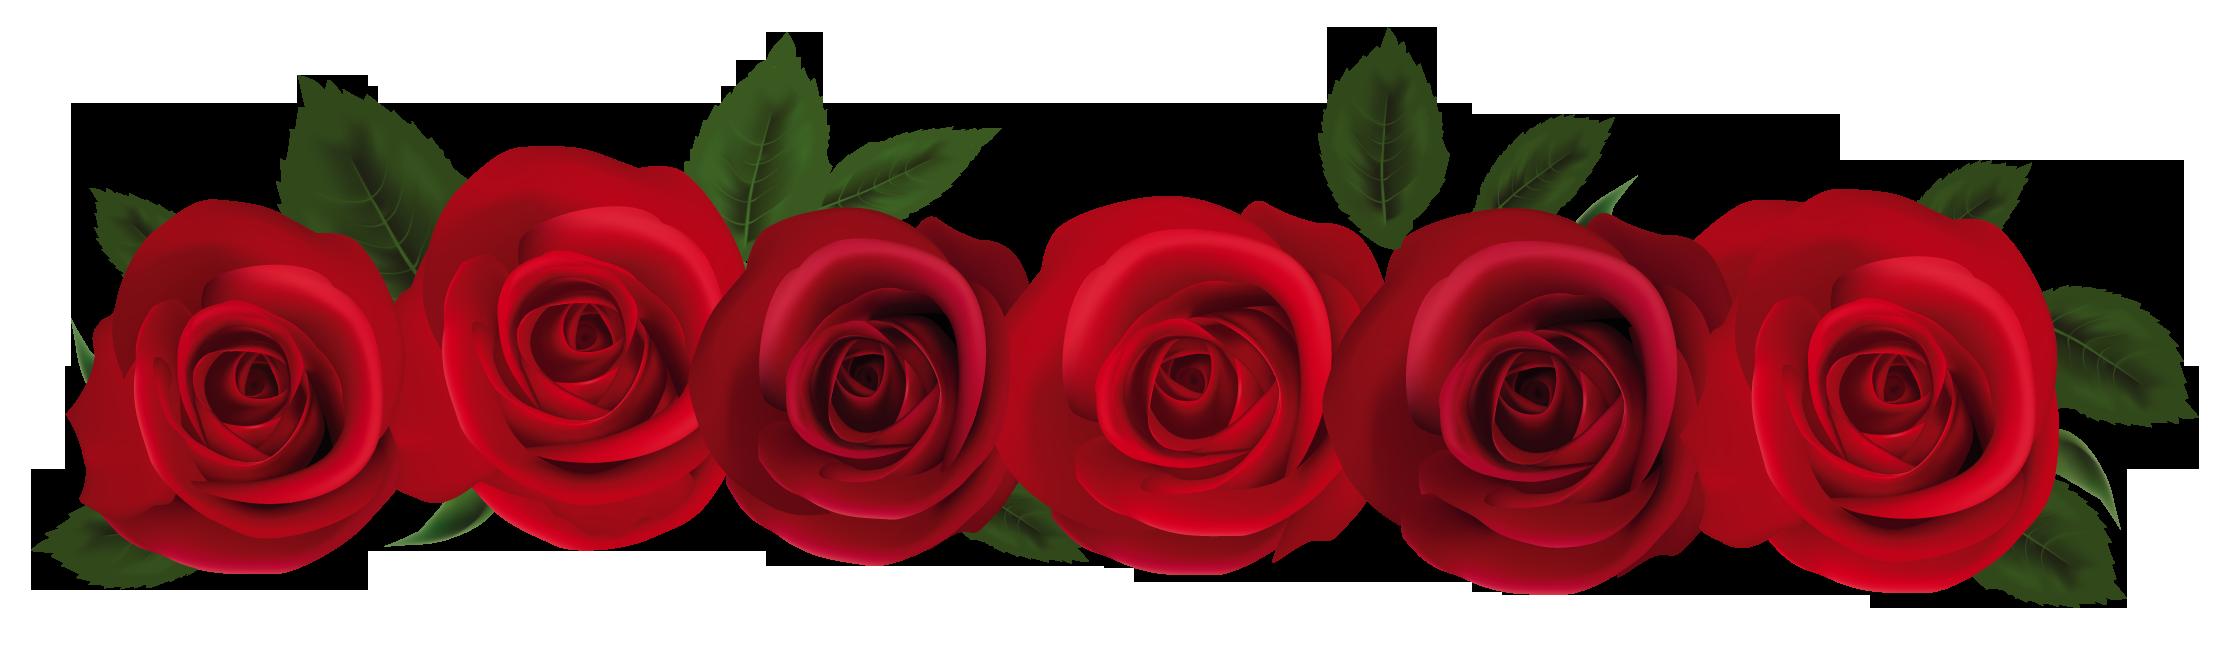 2219x649 Red Rose Clip Art